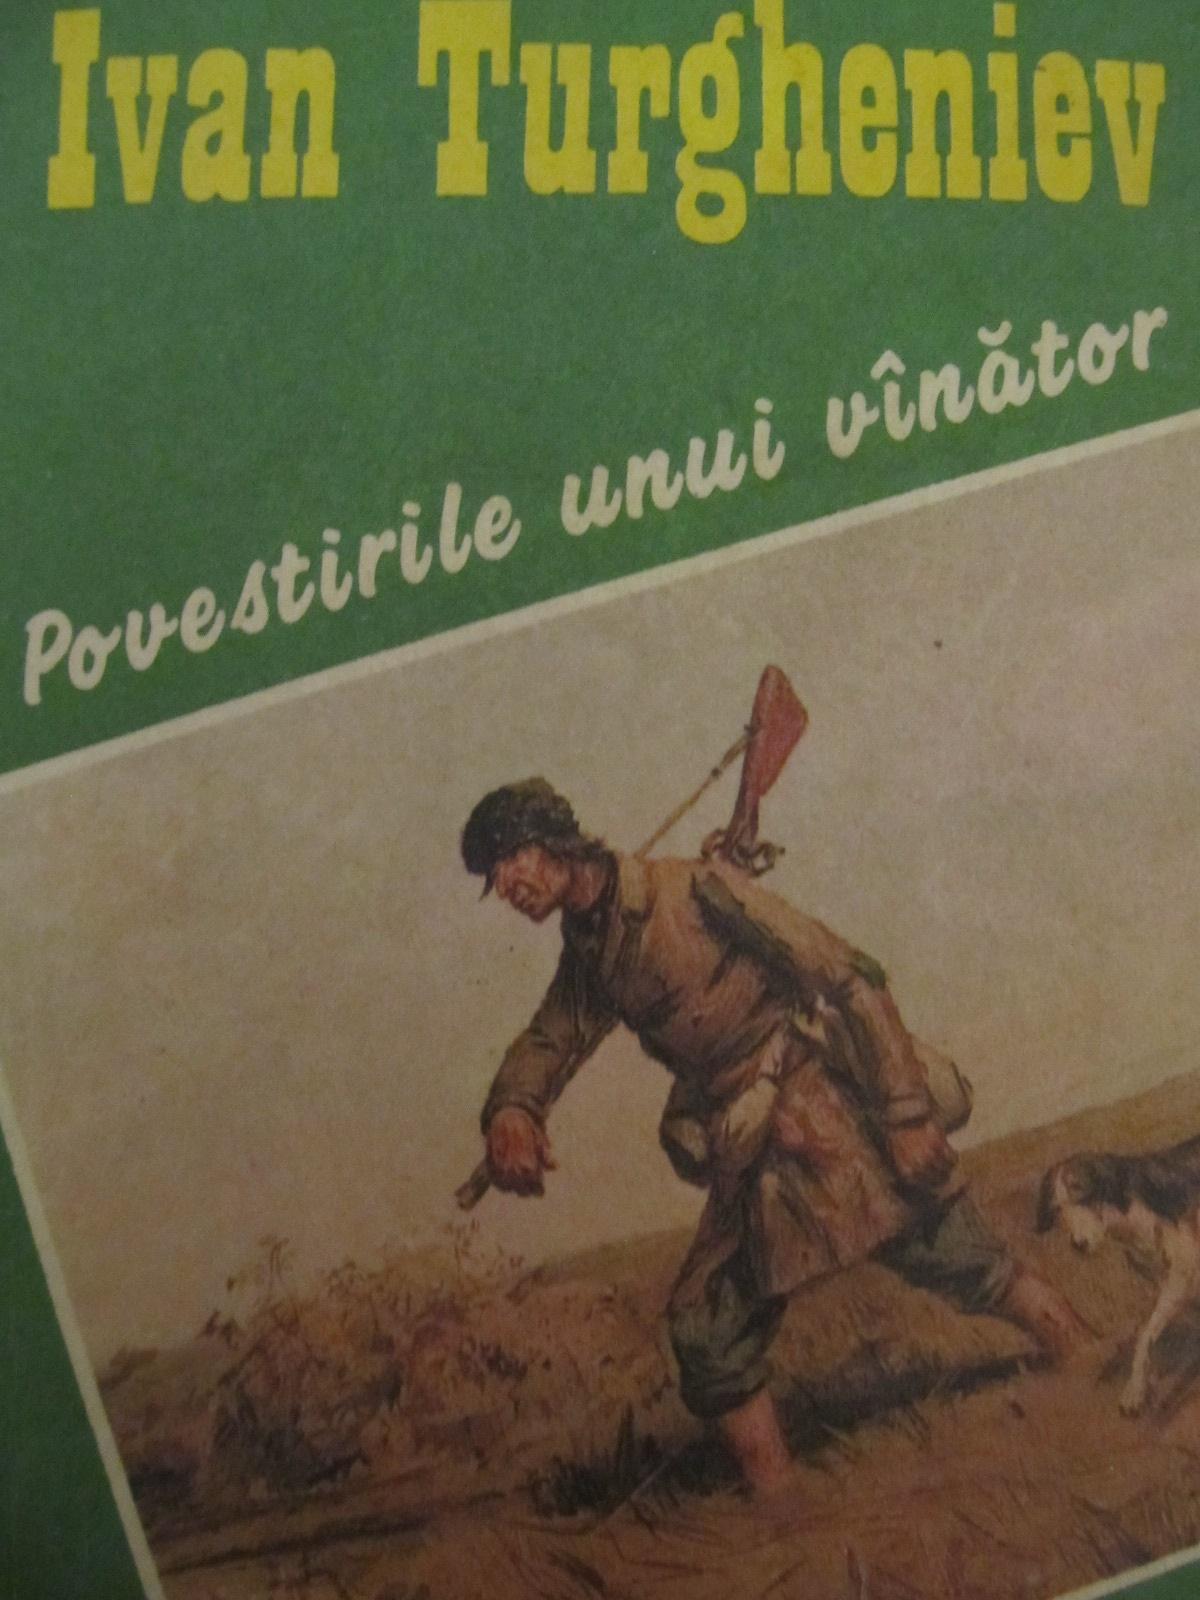 Povestirile unui vanator [1] - Ivan Turgheniev | Detalii carte